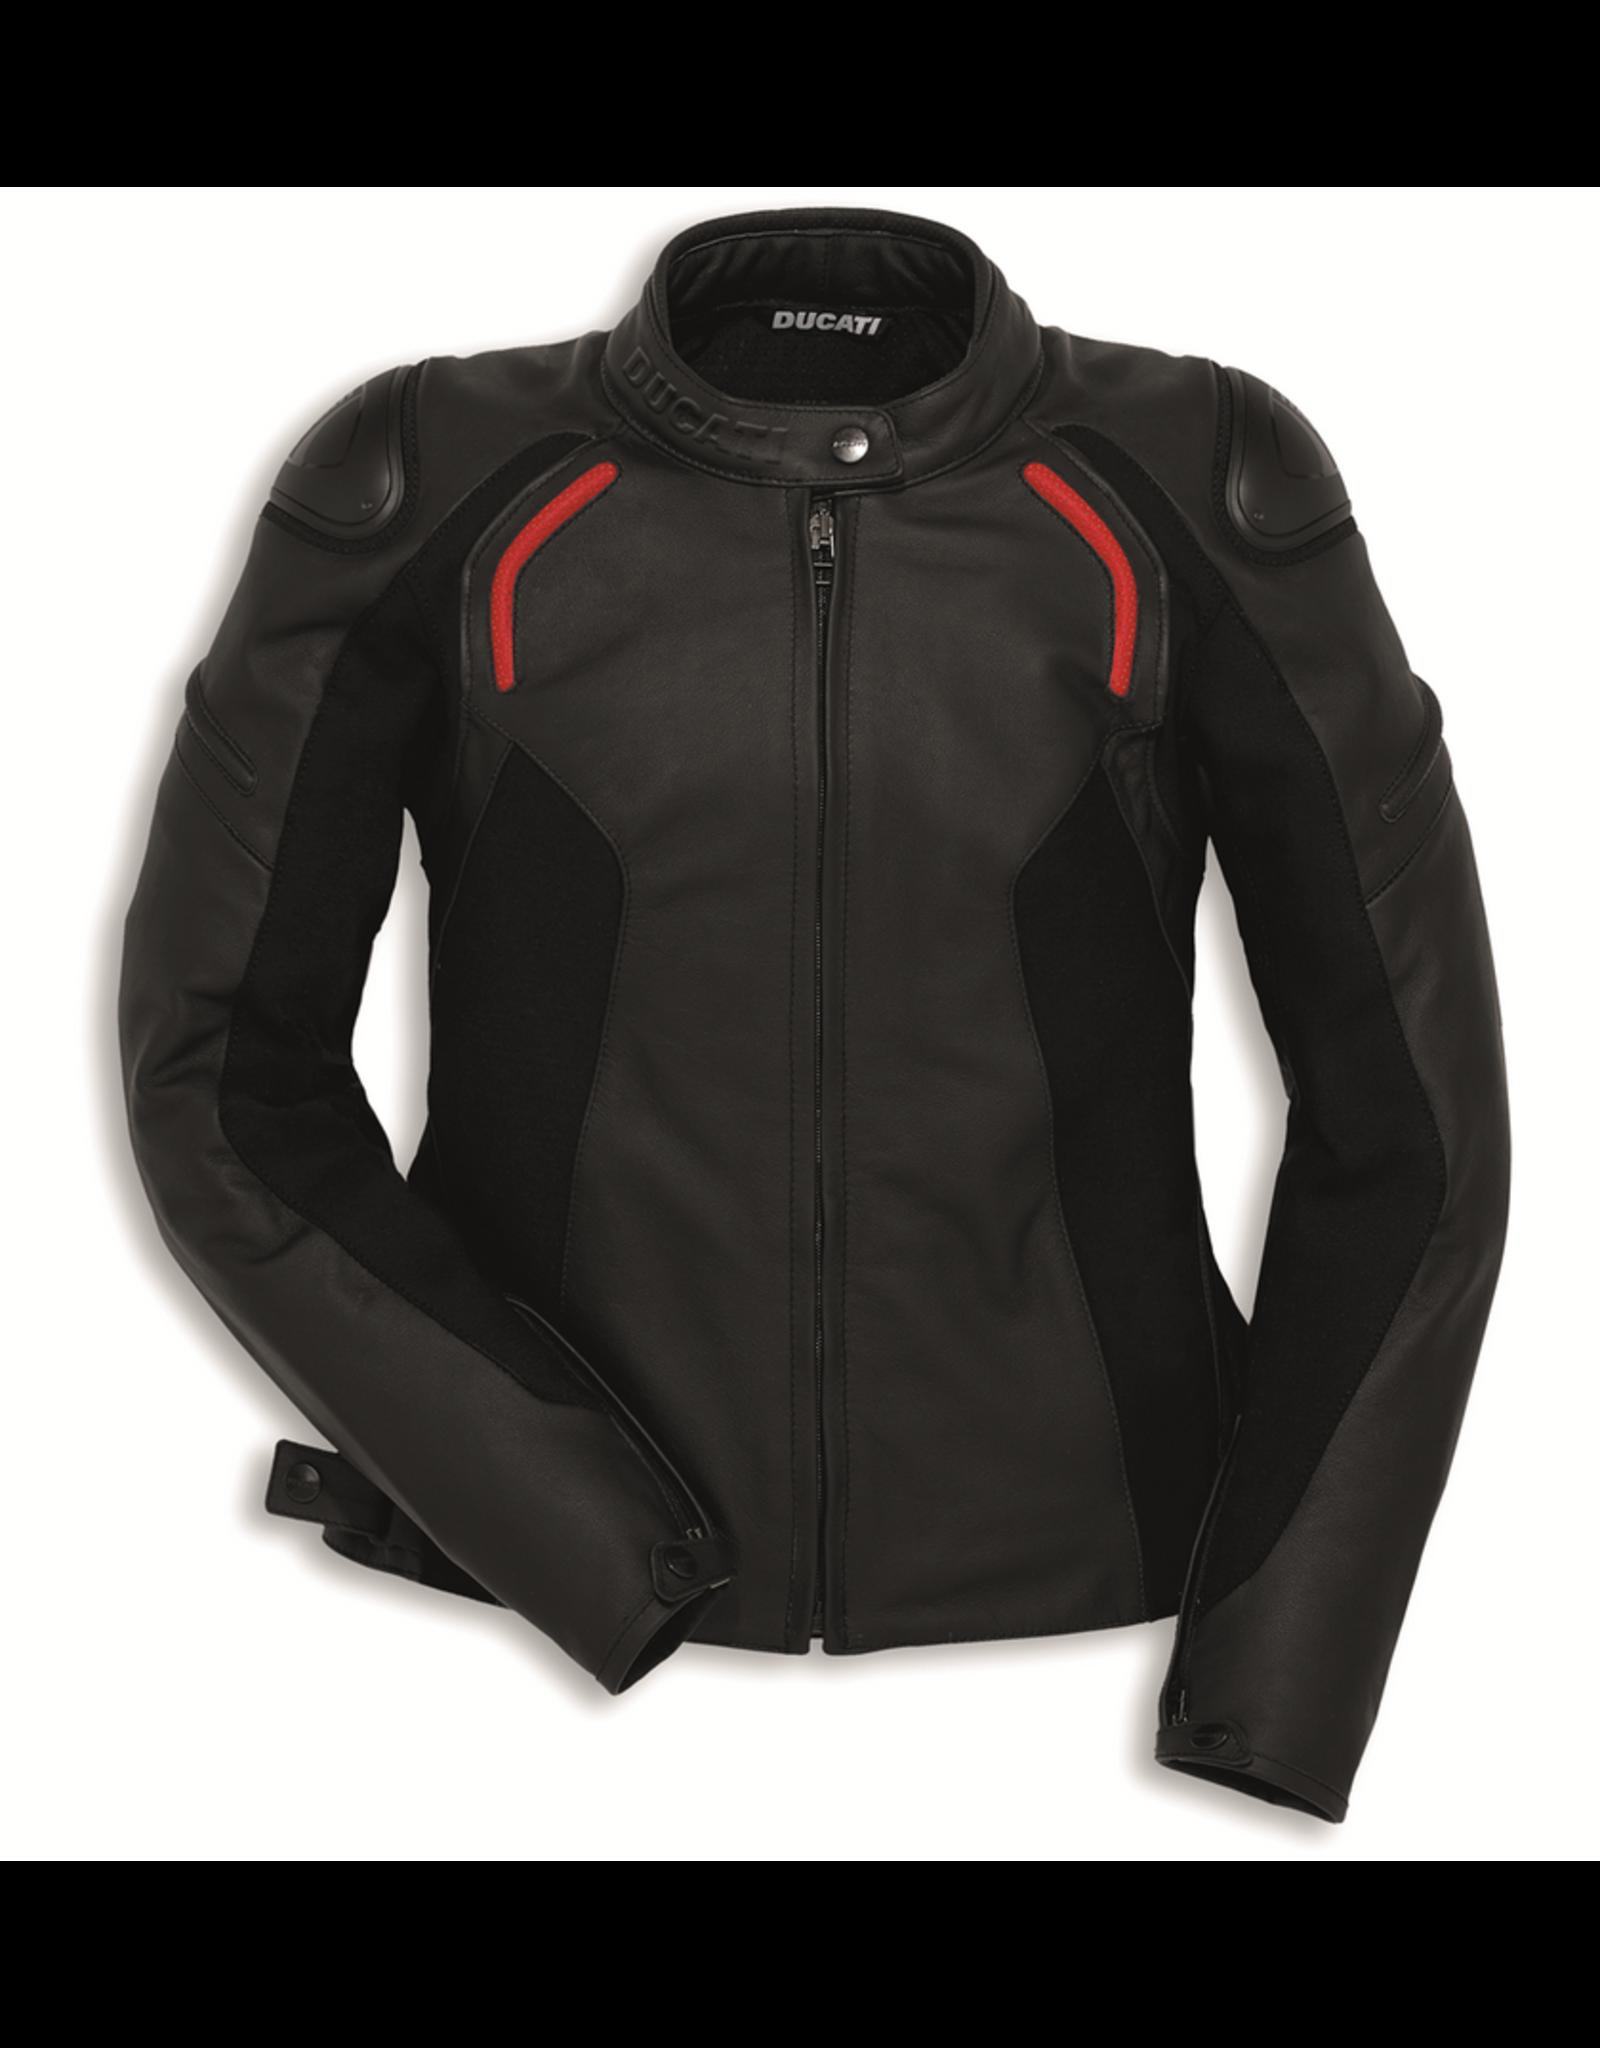 DAINESE Ducati Origineel LEREN JAS STEALTH C2 dames